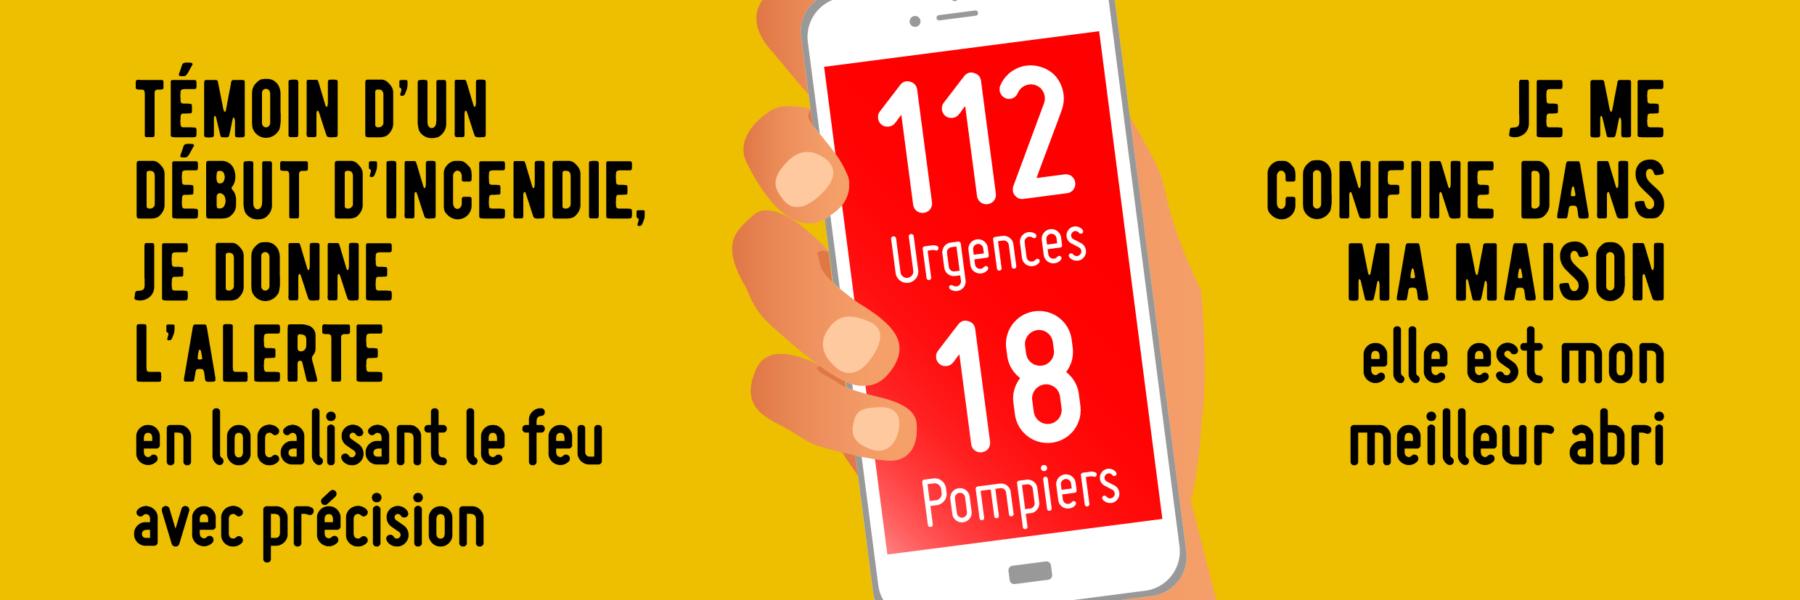 18104_sensibilisation-feuForet_vignette_encarts_alerte_1800x600_acf_cropped